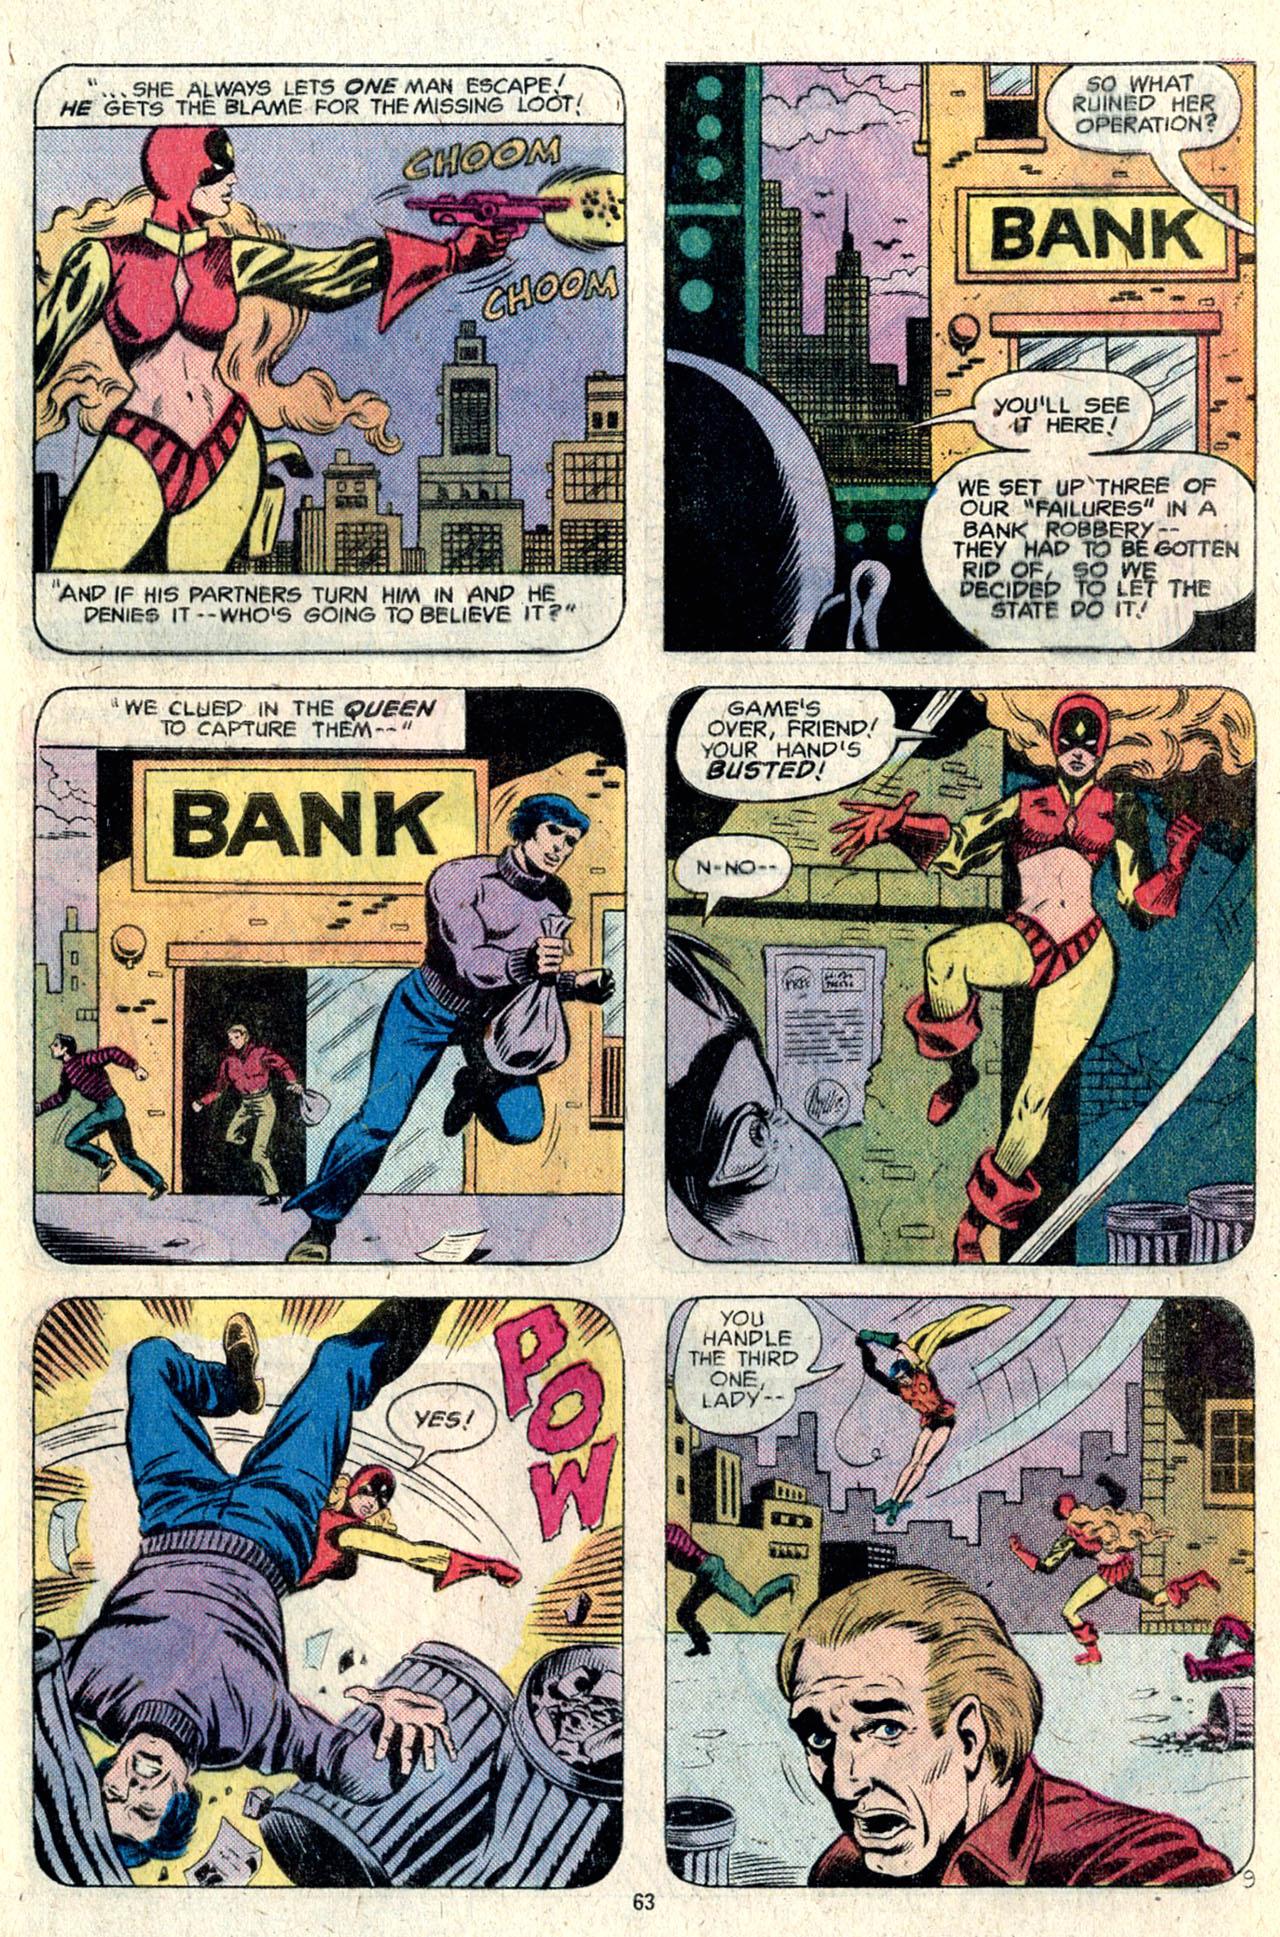 Detective Comics (1937) 482 Page 63